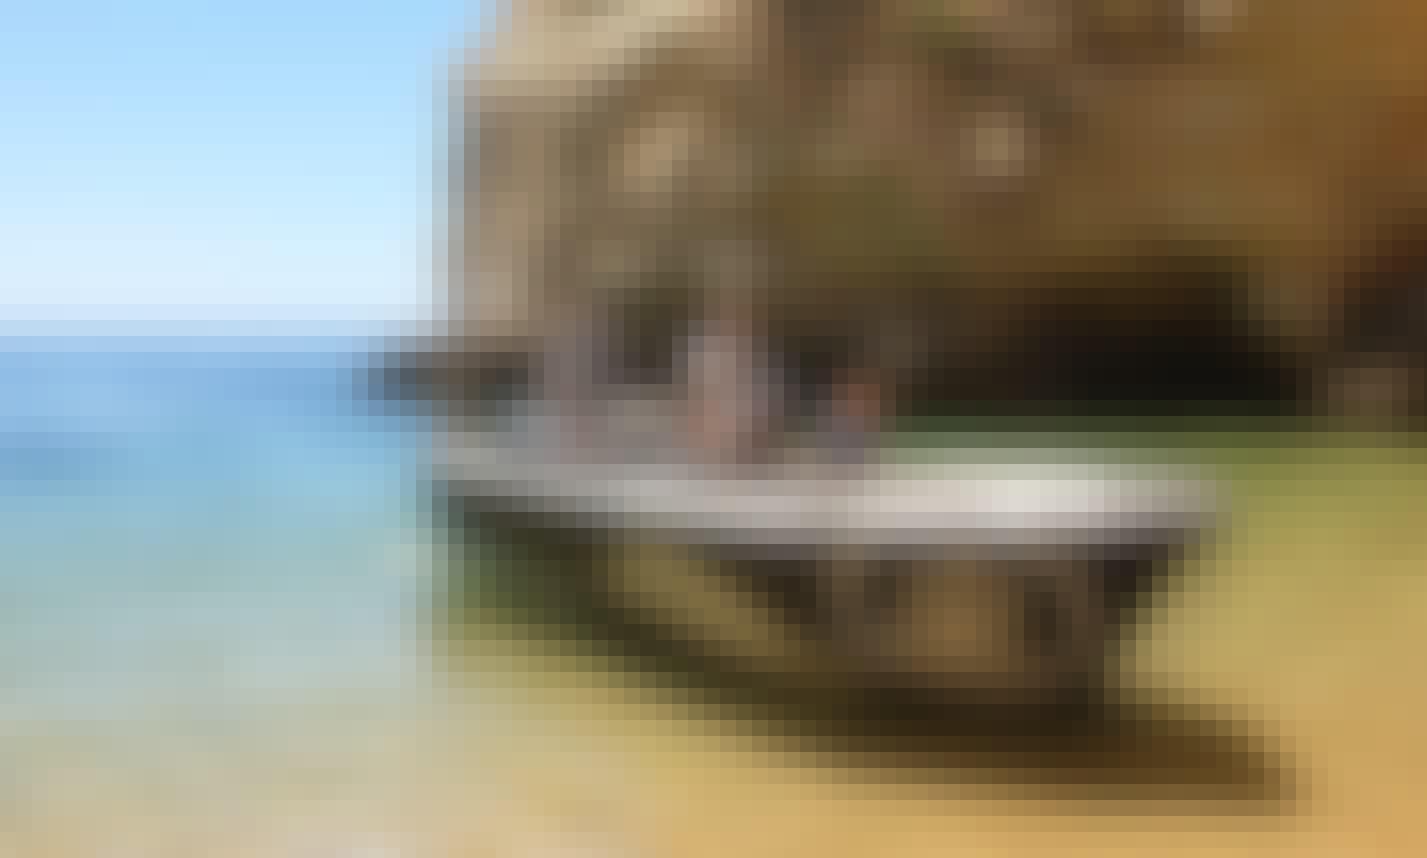 Benagil Caves - Private Benagil Caves Boat Tour from Armacao de Pera, Algarve